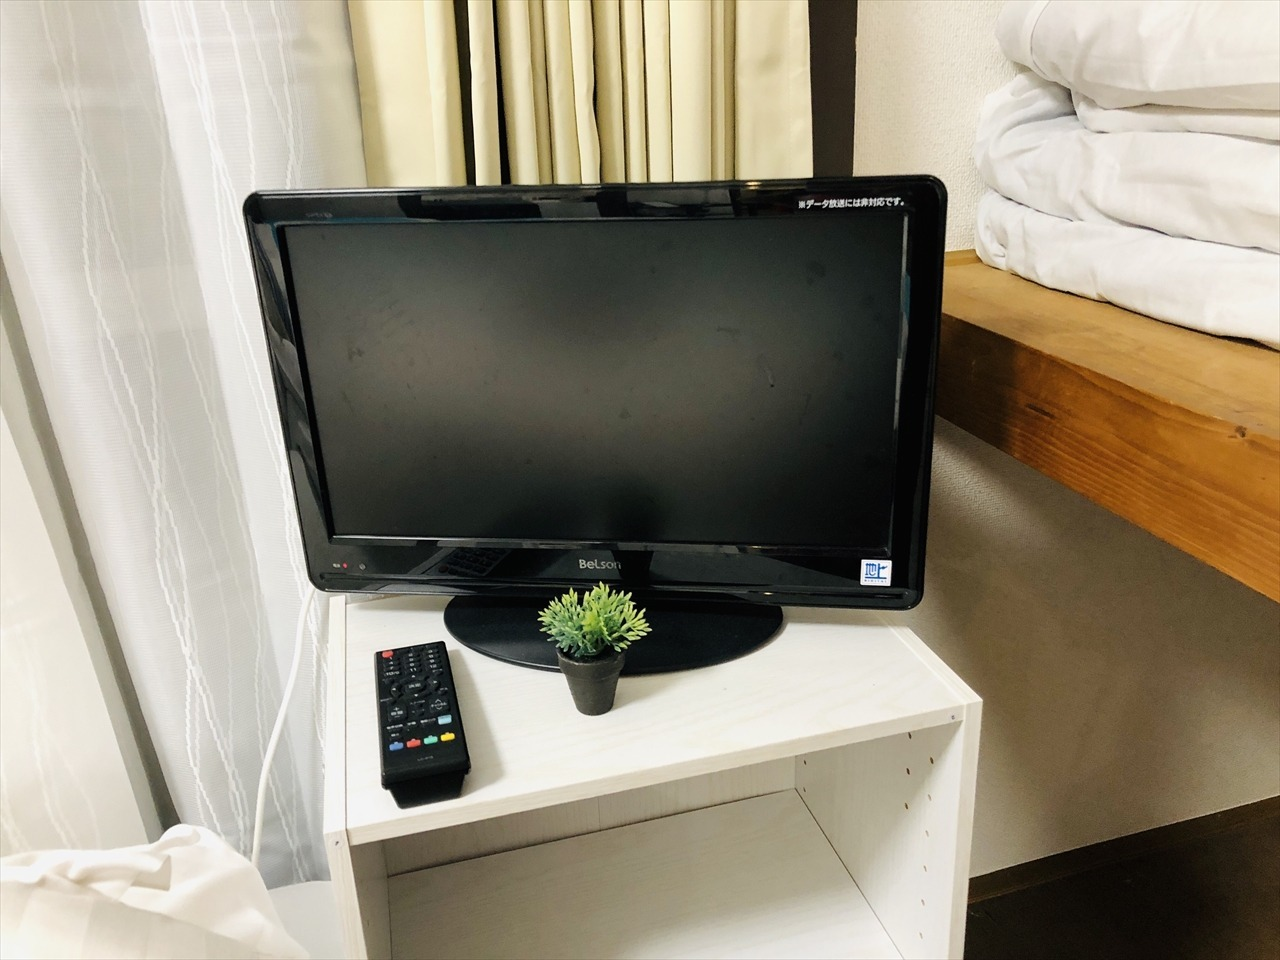 Convenient amenities